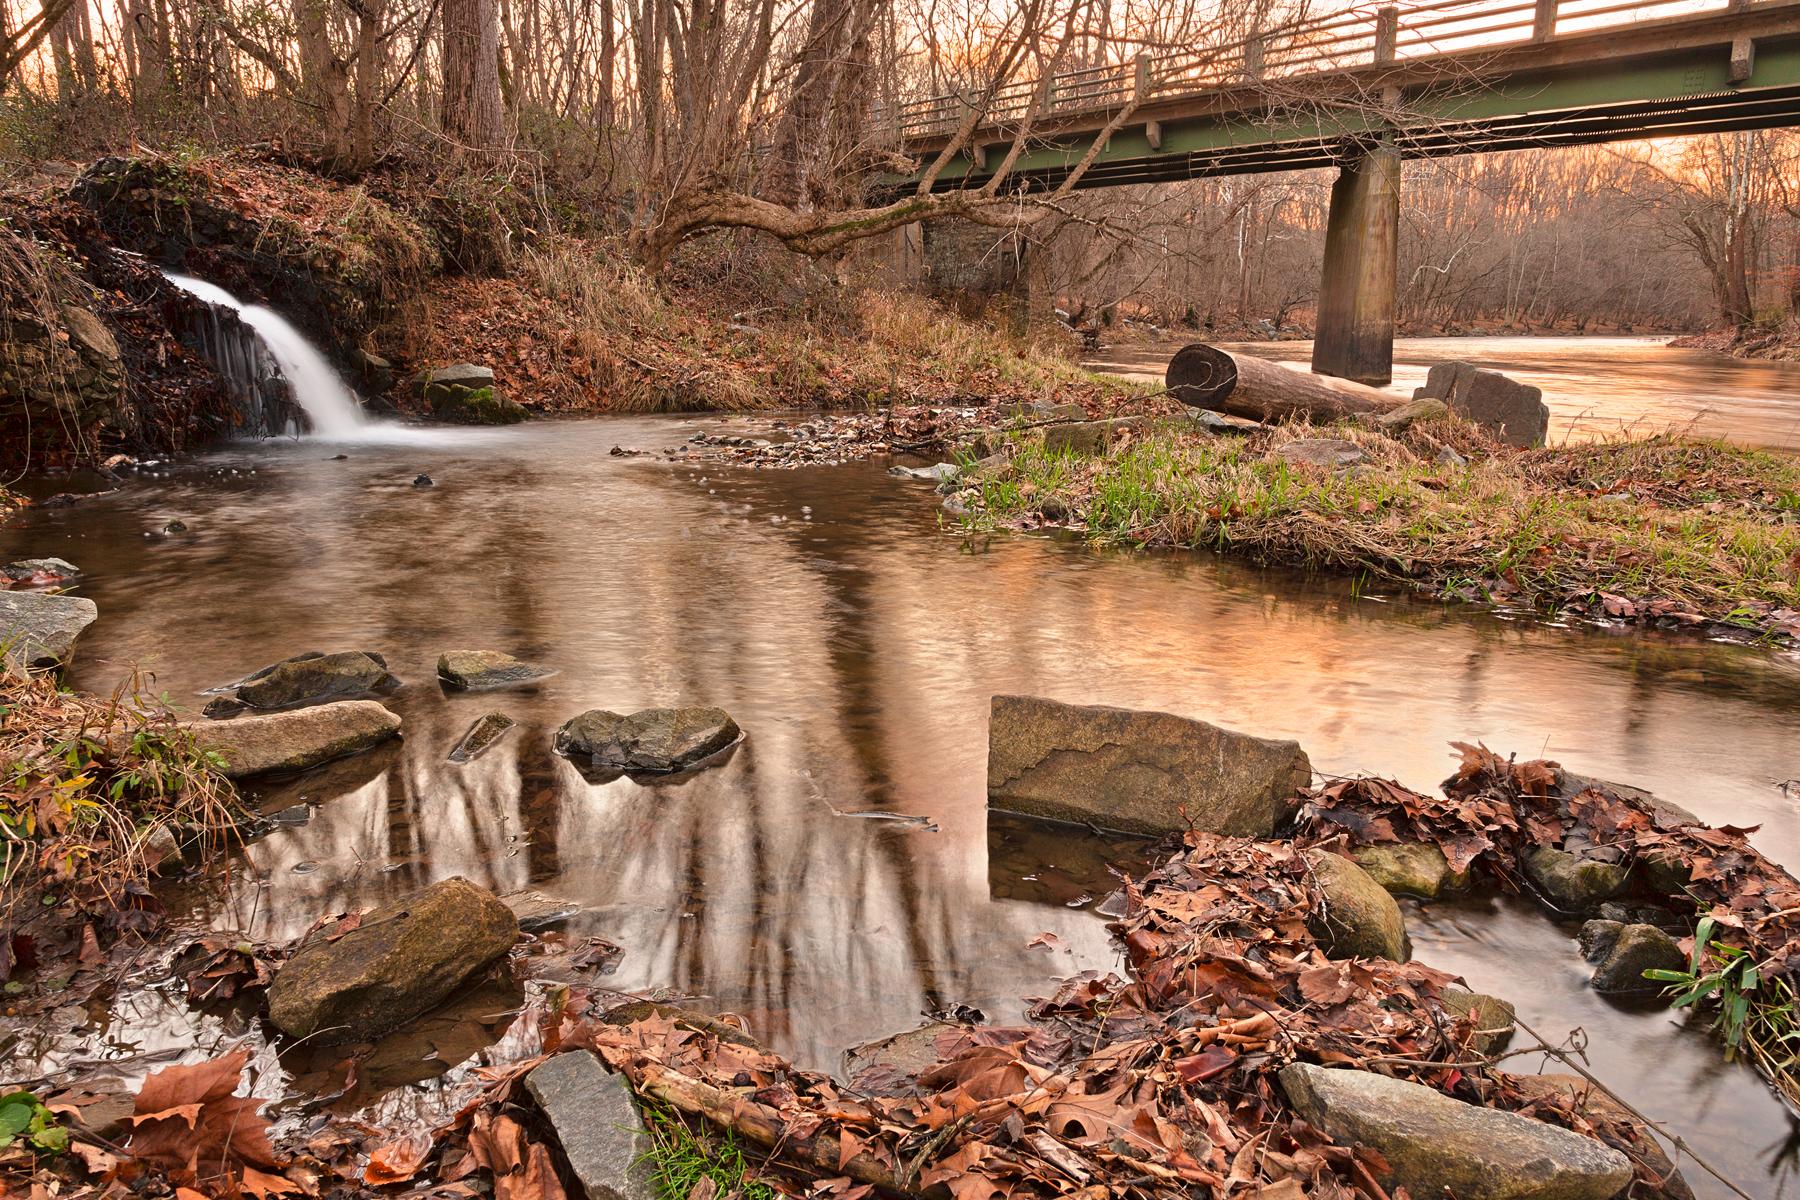 Susquehanna Sunset Stream - HDR, Afternoon, Pretty, Shades, Shade, HQ Photo